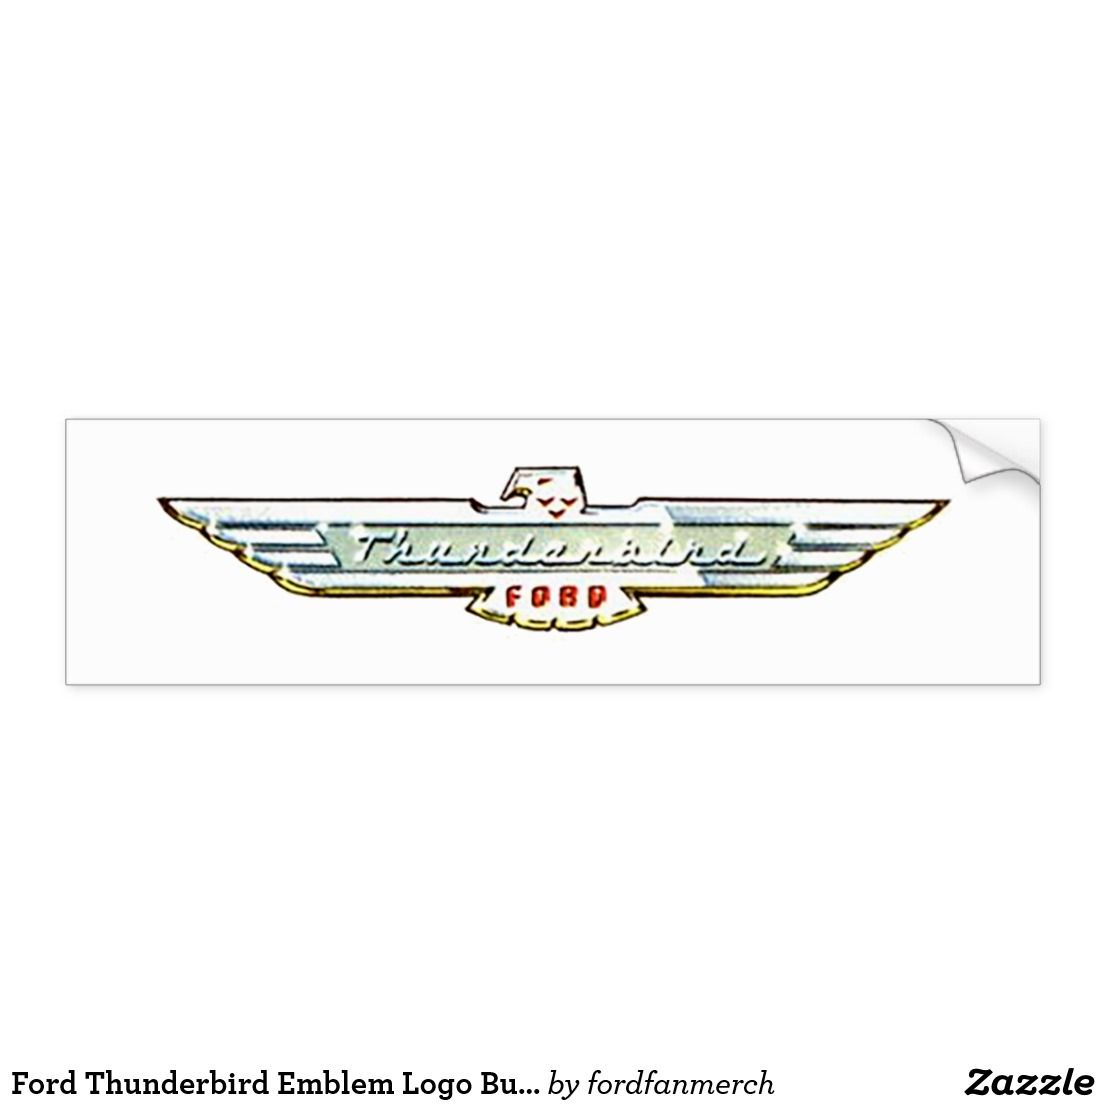 Ford Thunderbird Emblem Logo Bumper Sticker Zazzle Mrtbird Thunderbird Fordclassiccars 1950s Classiccars G Bumper Stickers Emblem Logo Ford Classic Cars [ 1106 x 1106 Pixel ]